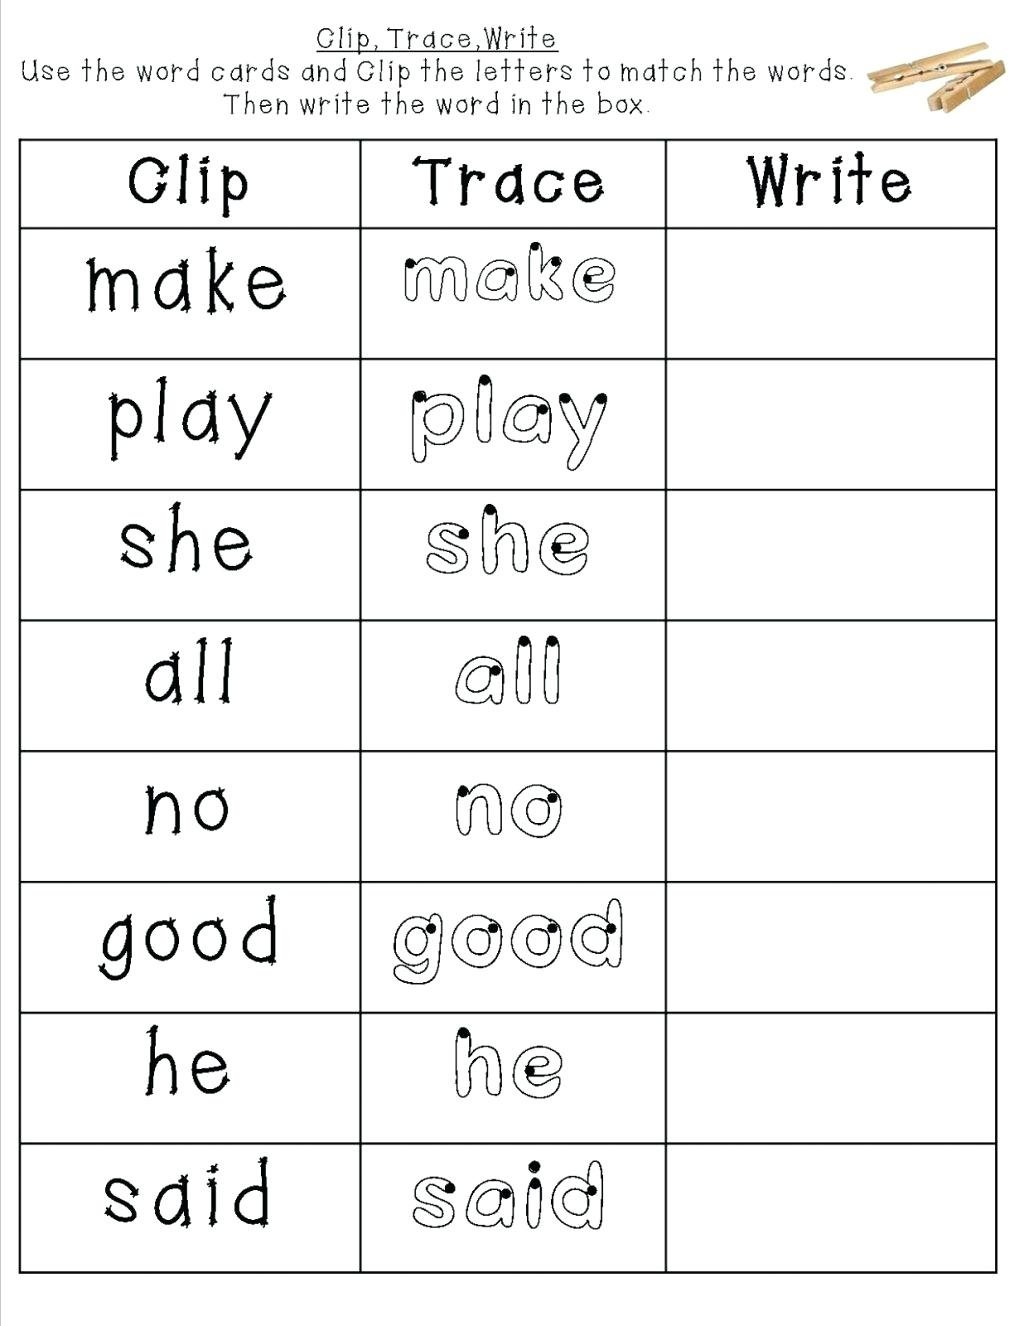 Kindergarten Toddler Tracing Printables Complete The Number Pattern In Tracing Worksheets For Kindergarten